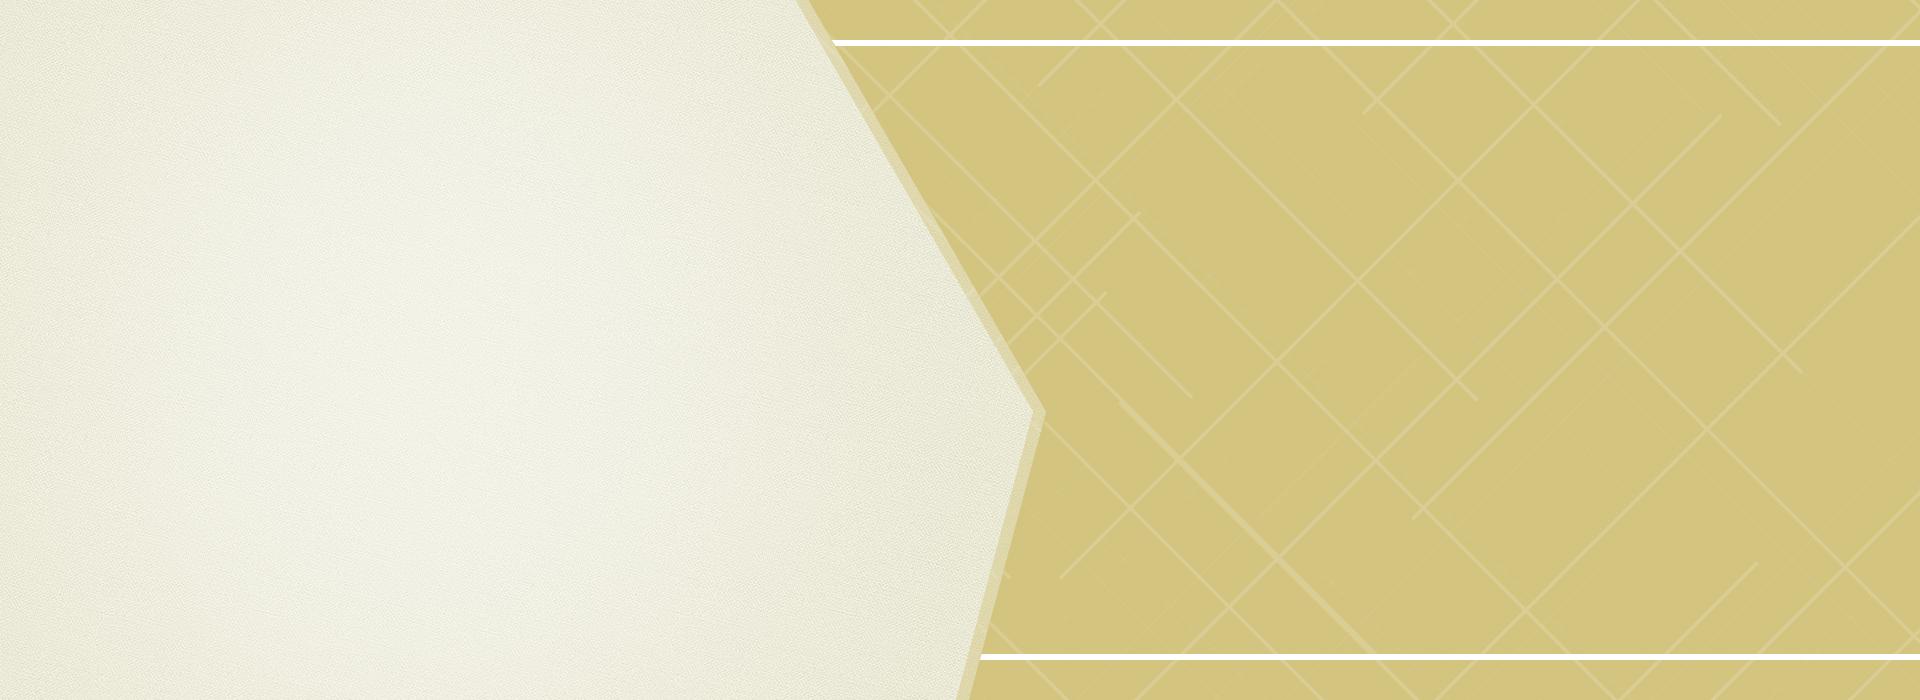 1593998-1490287433